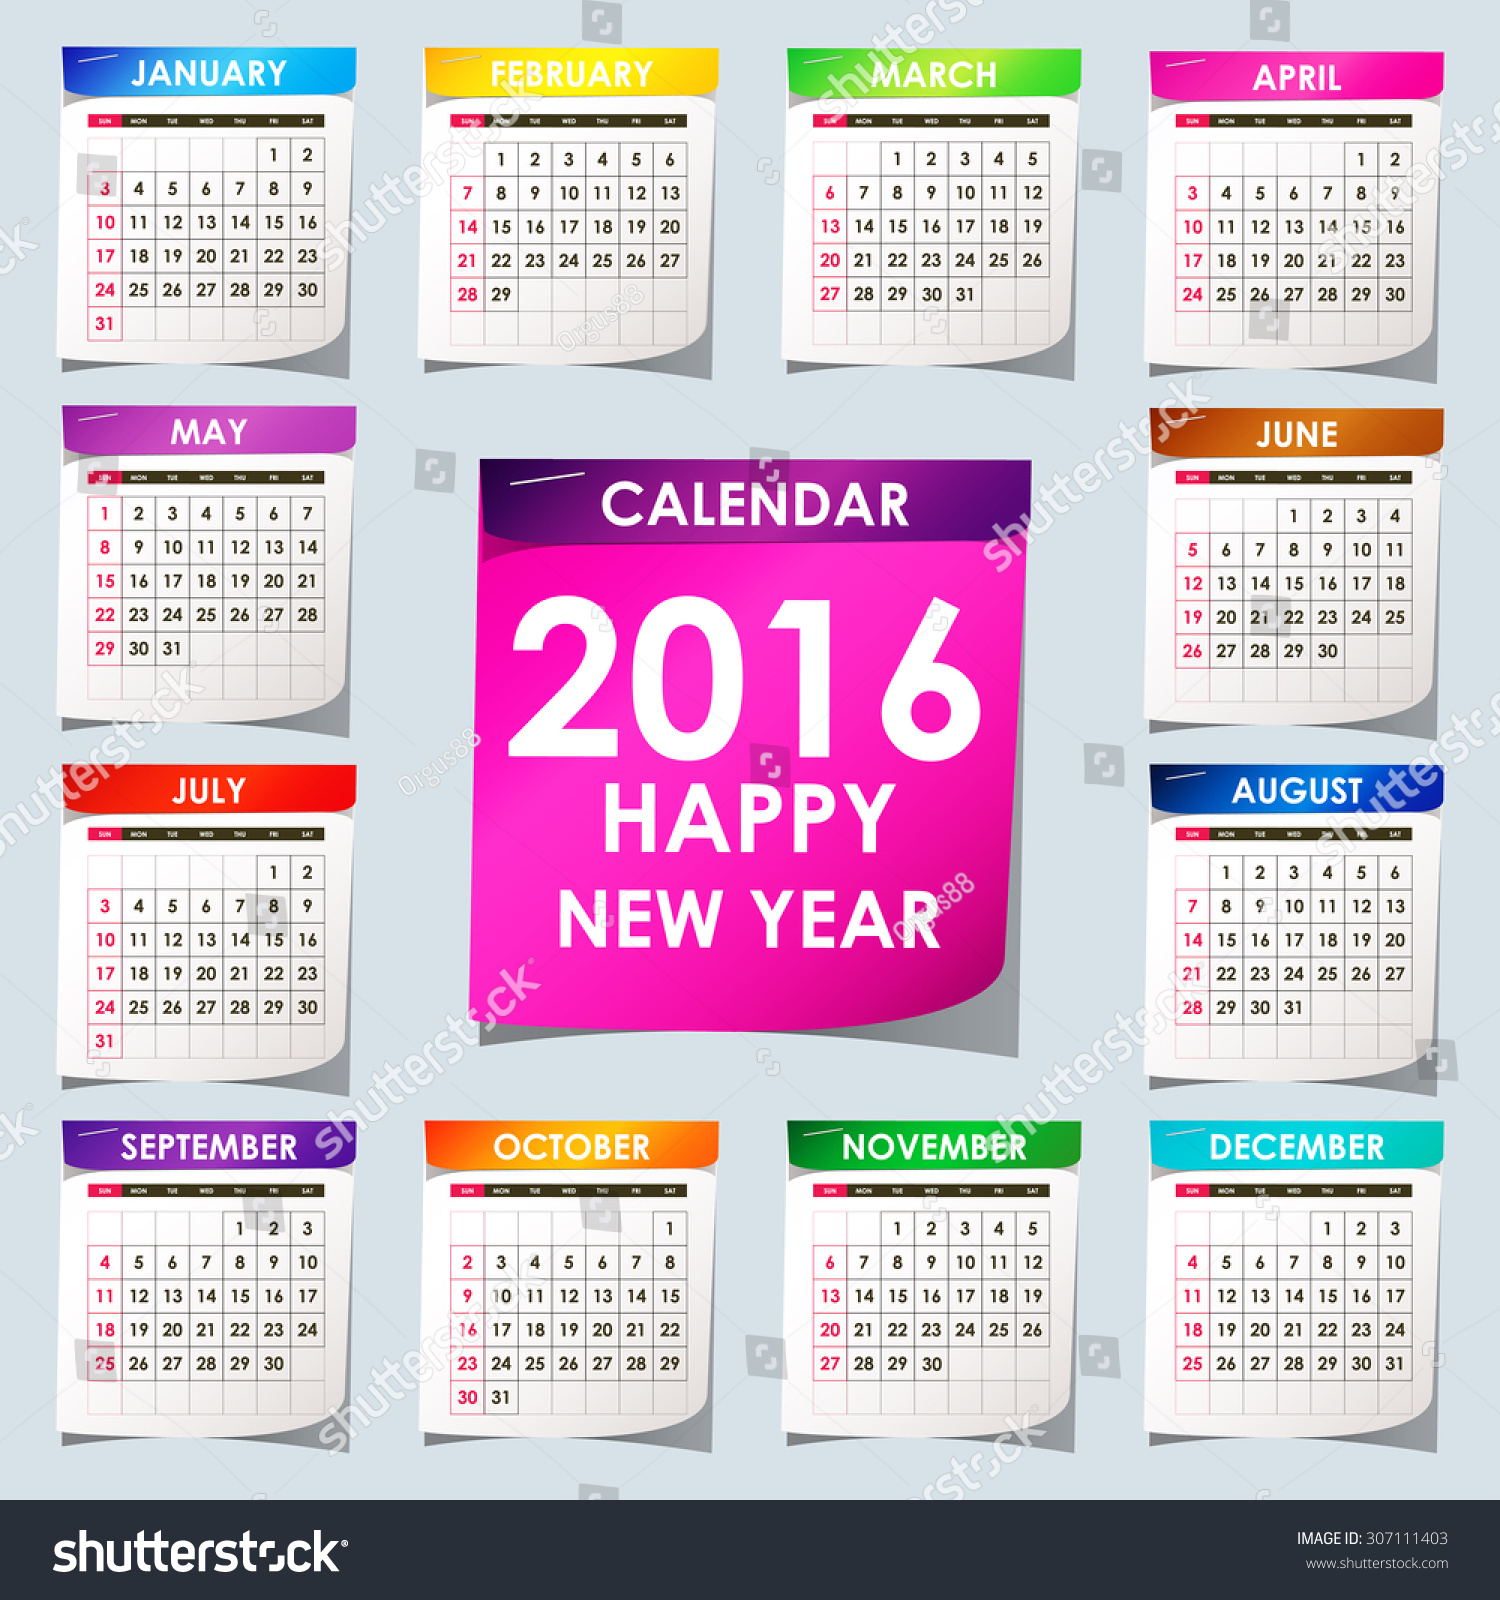 Vertical Calendar Design : Simple calendar design stock vector